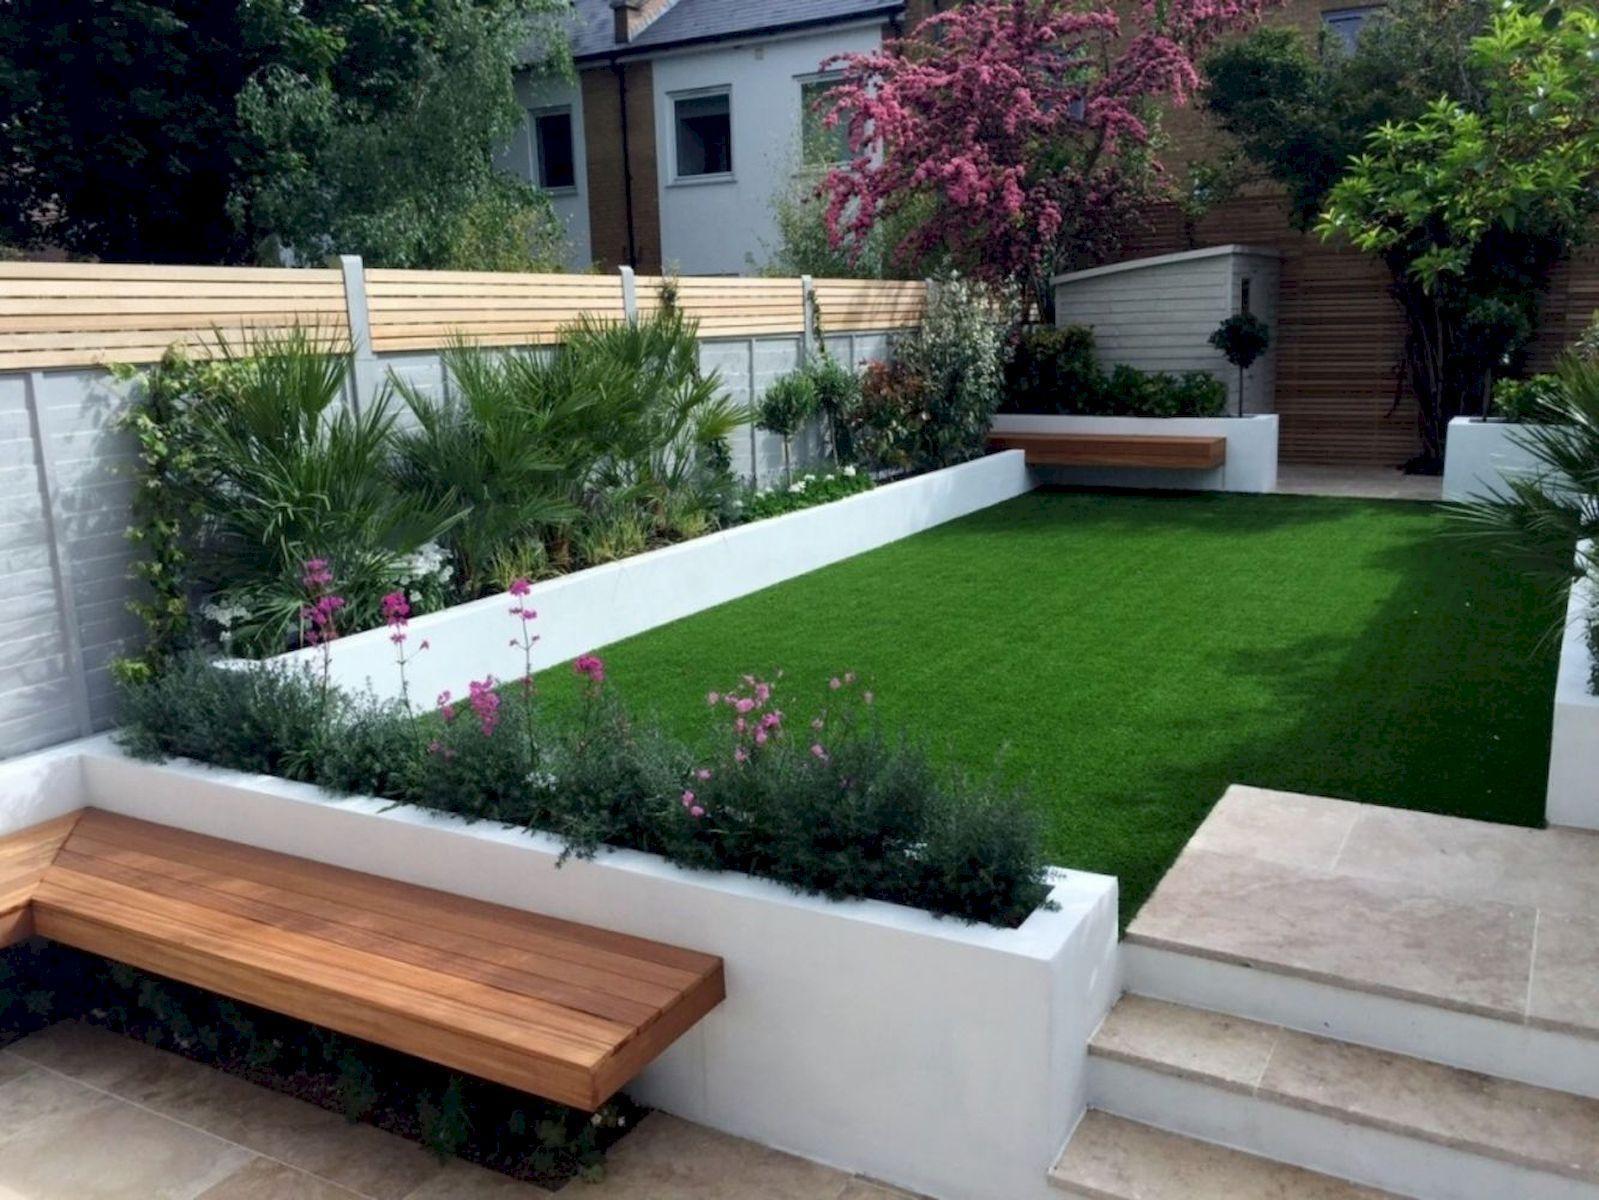 45 Minimalist Garden For Backyard Ideas In 2020 Modern Garden Landscaping Modern Garden Design Contemporary Garden Design